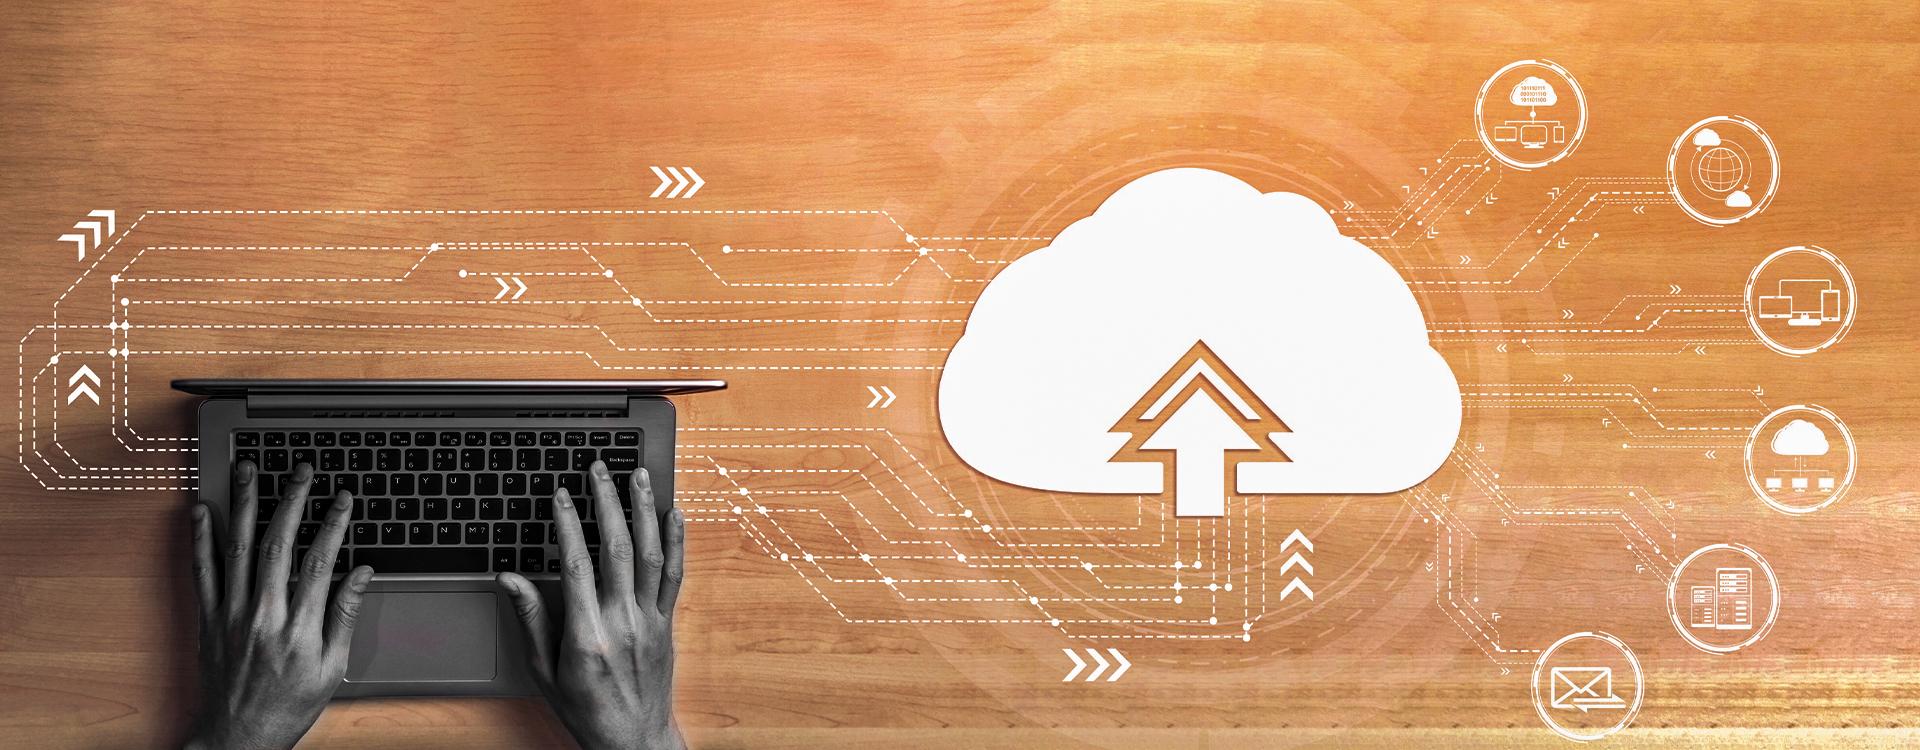 Building Digital Infrastructure for Entrepreneurial Success